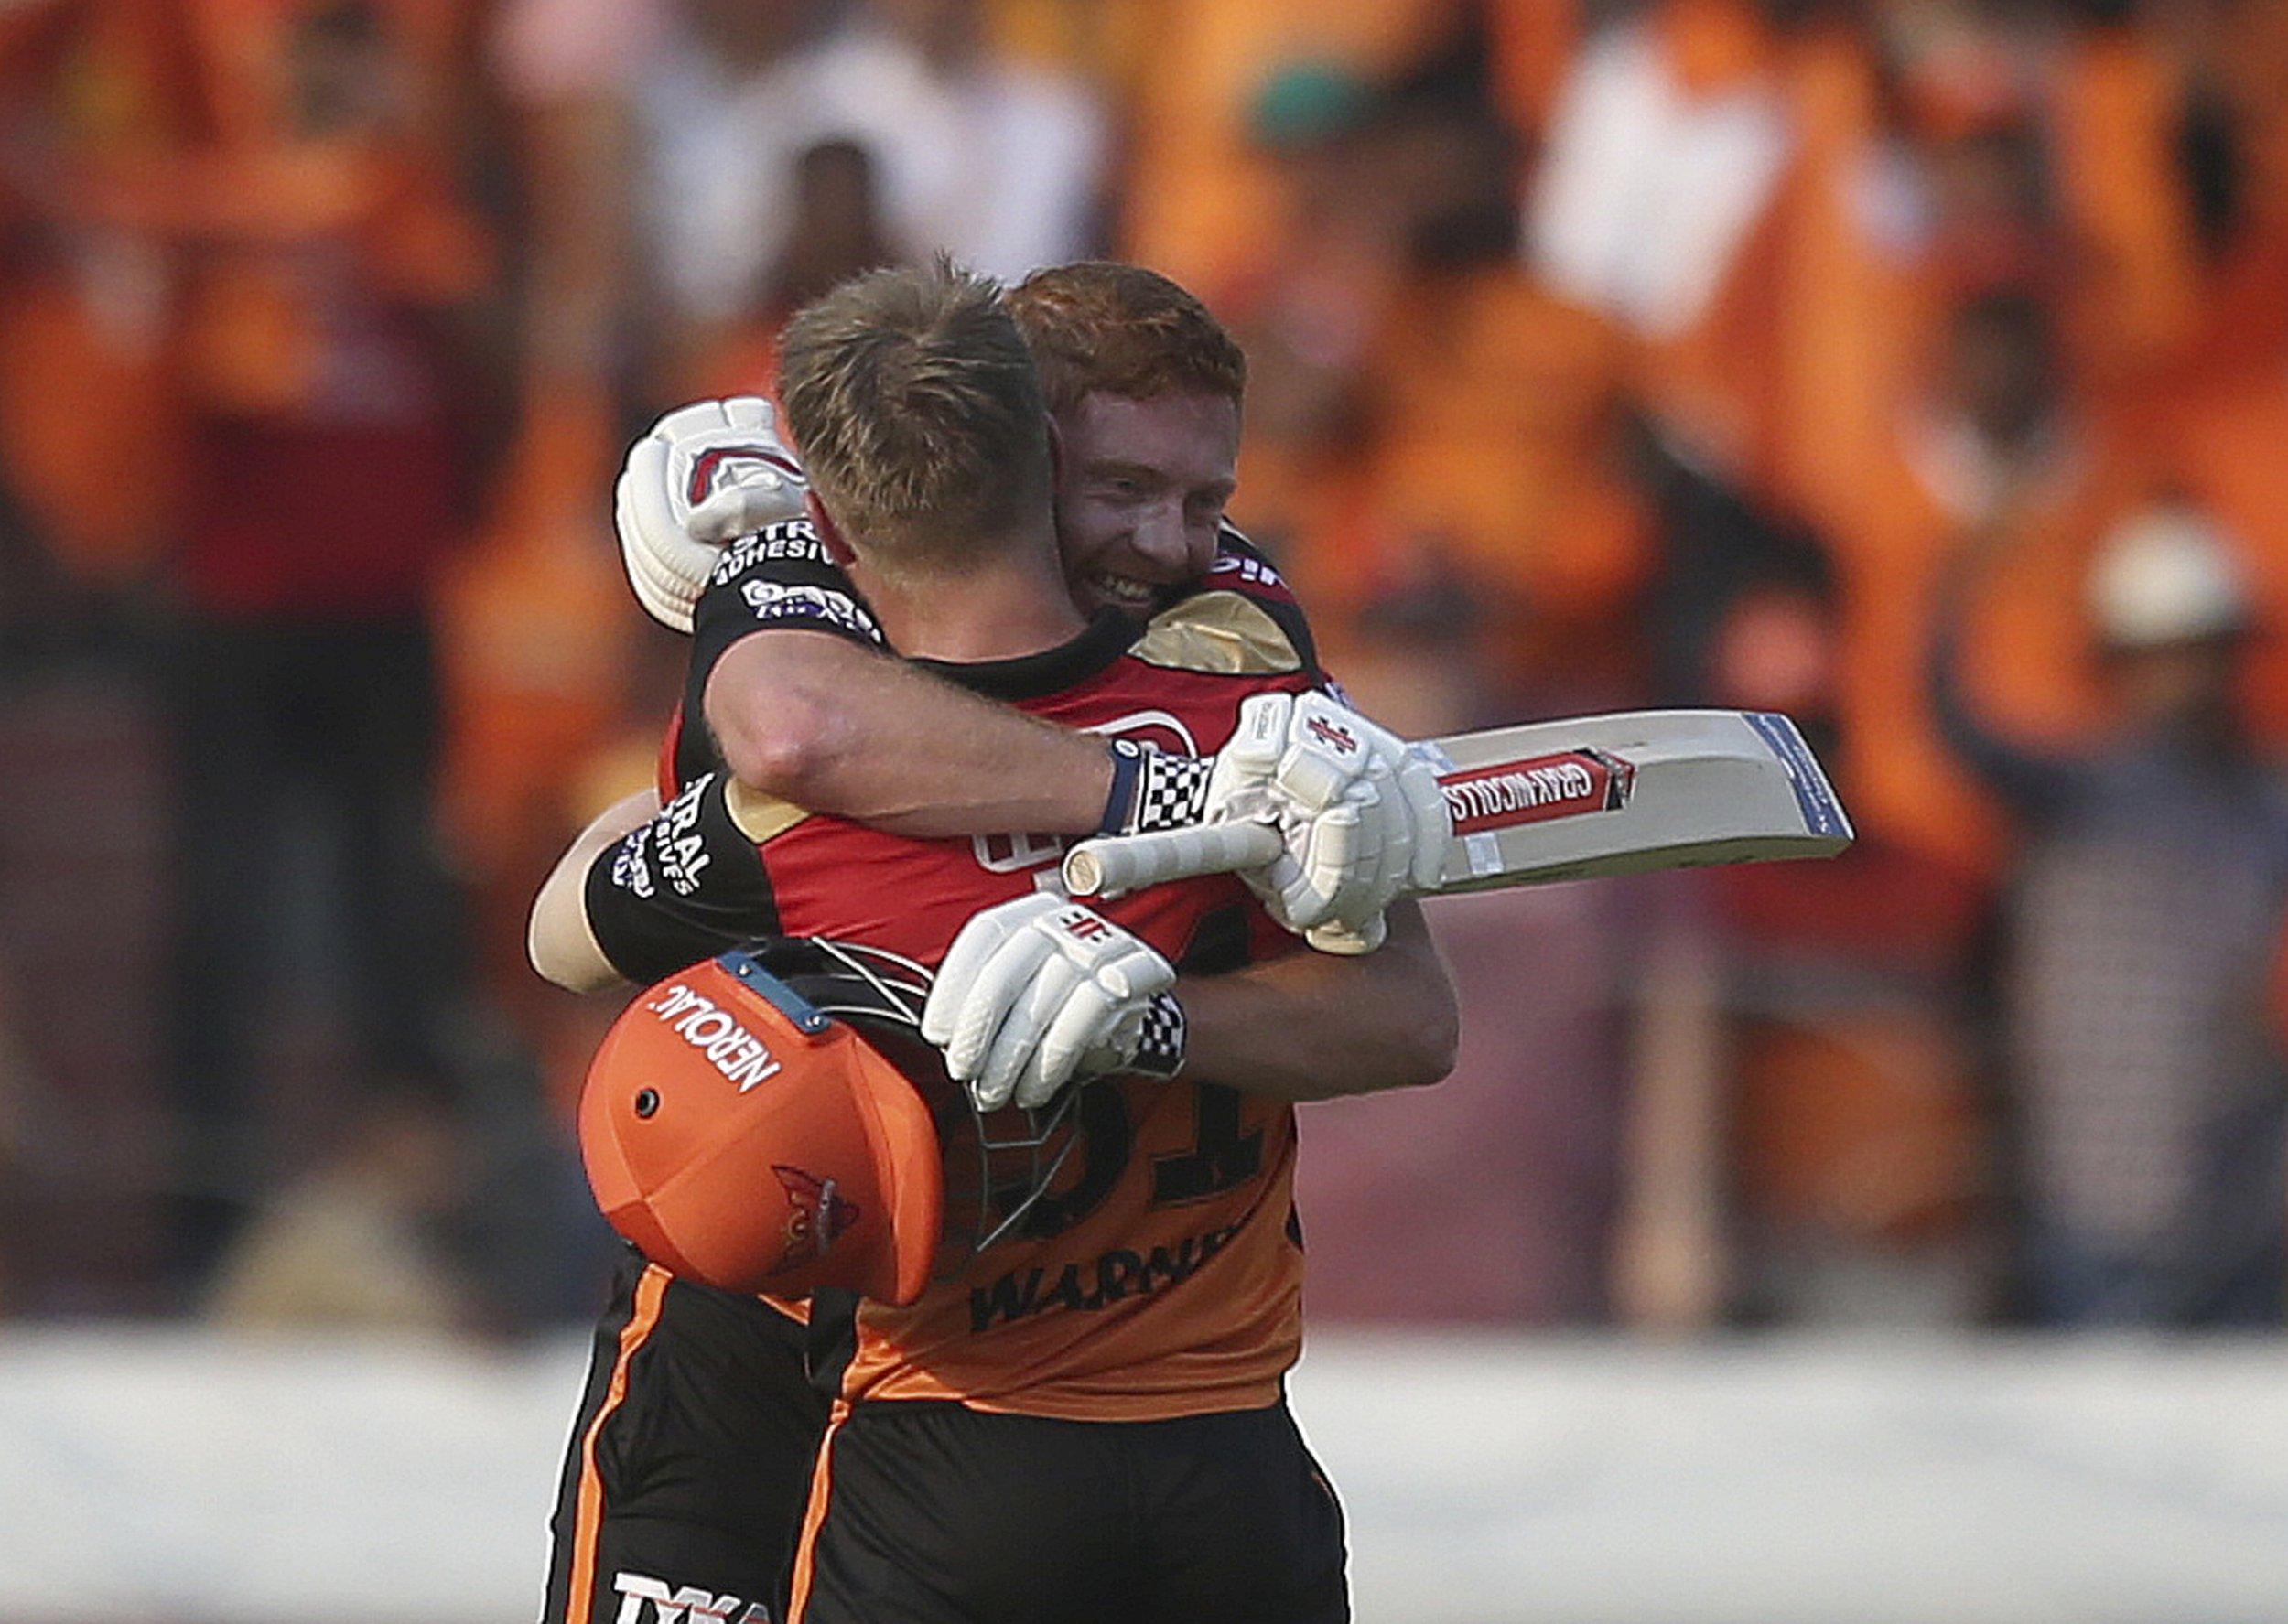 Sunrisers Hyderabad's David Warner hugs Jonny Bairstow on scoring hundred runs against Royal Challengers Bangalore during the VIVO IPL T20 cricket match in Hyderabad, India, Sunday, March 31, 2019. (AP Photo/ Mahesh Kumar A.)